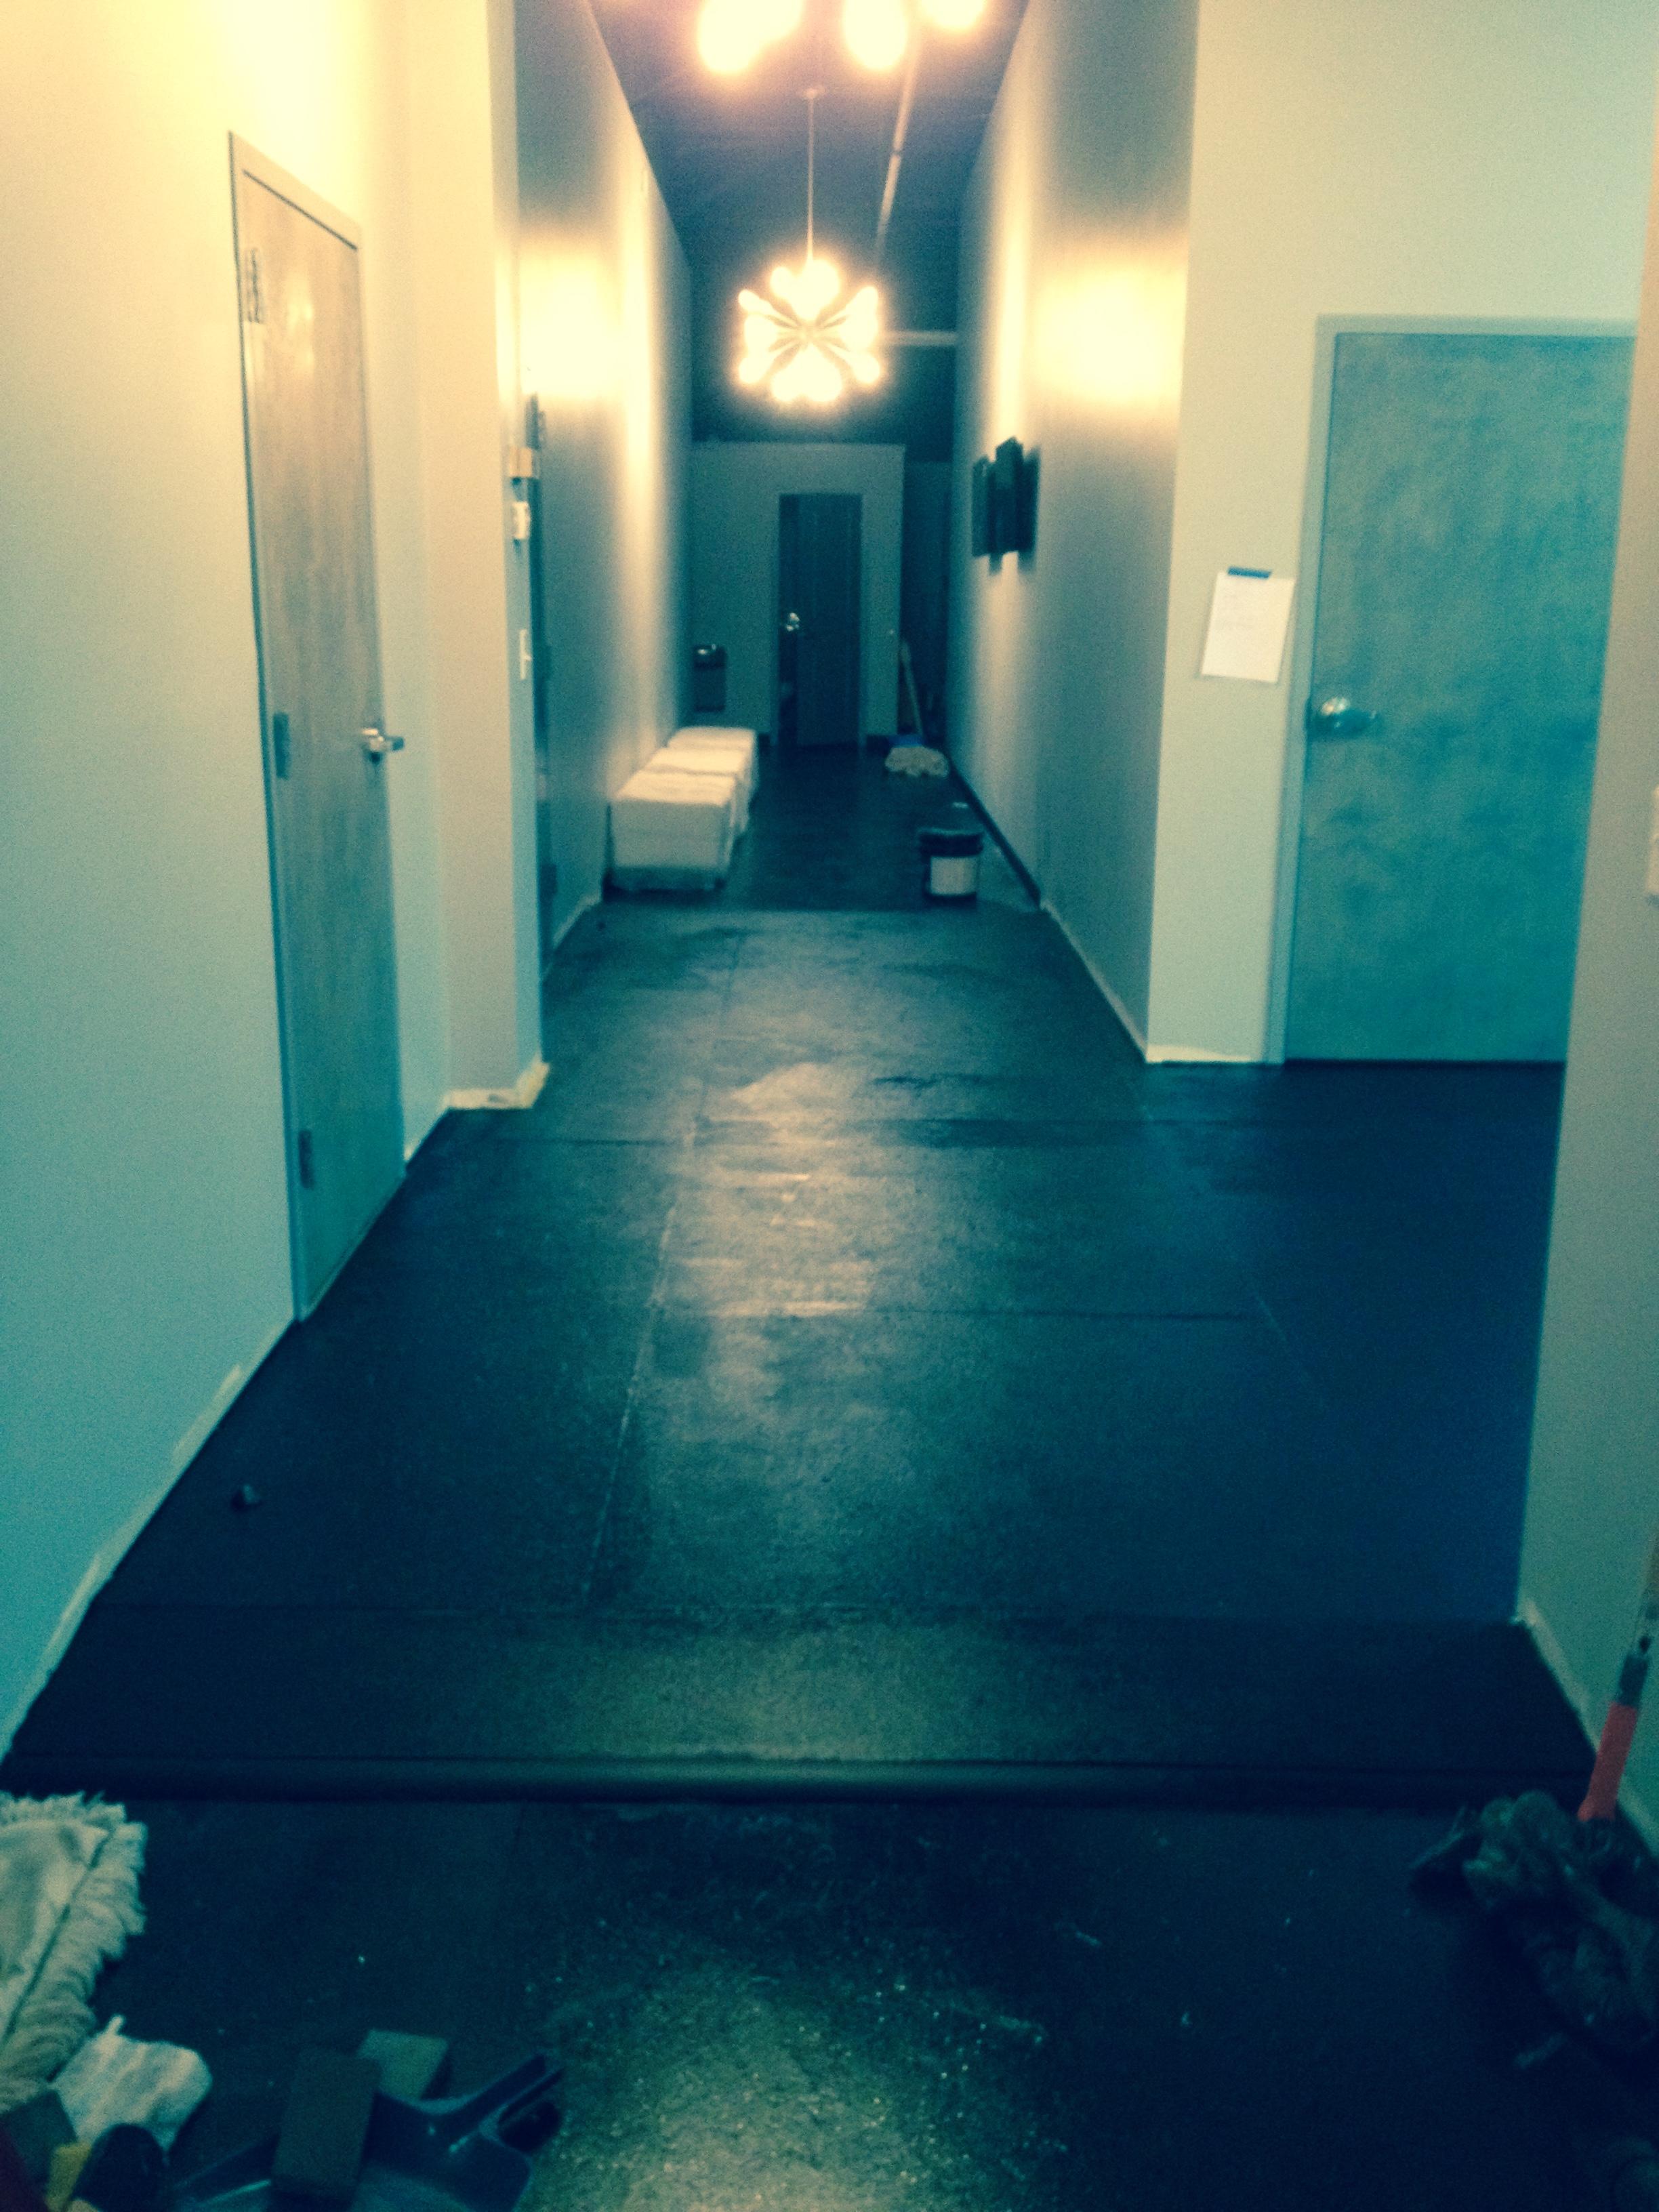 Hallway to locker areas